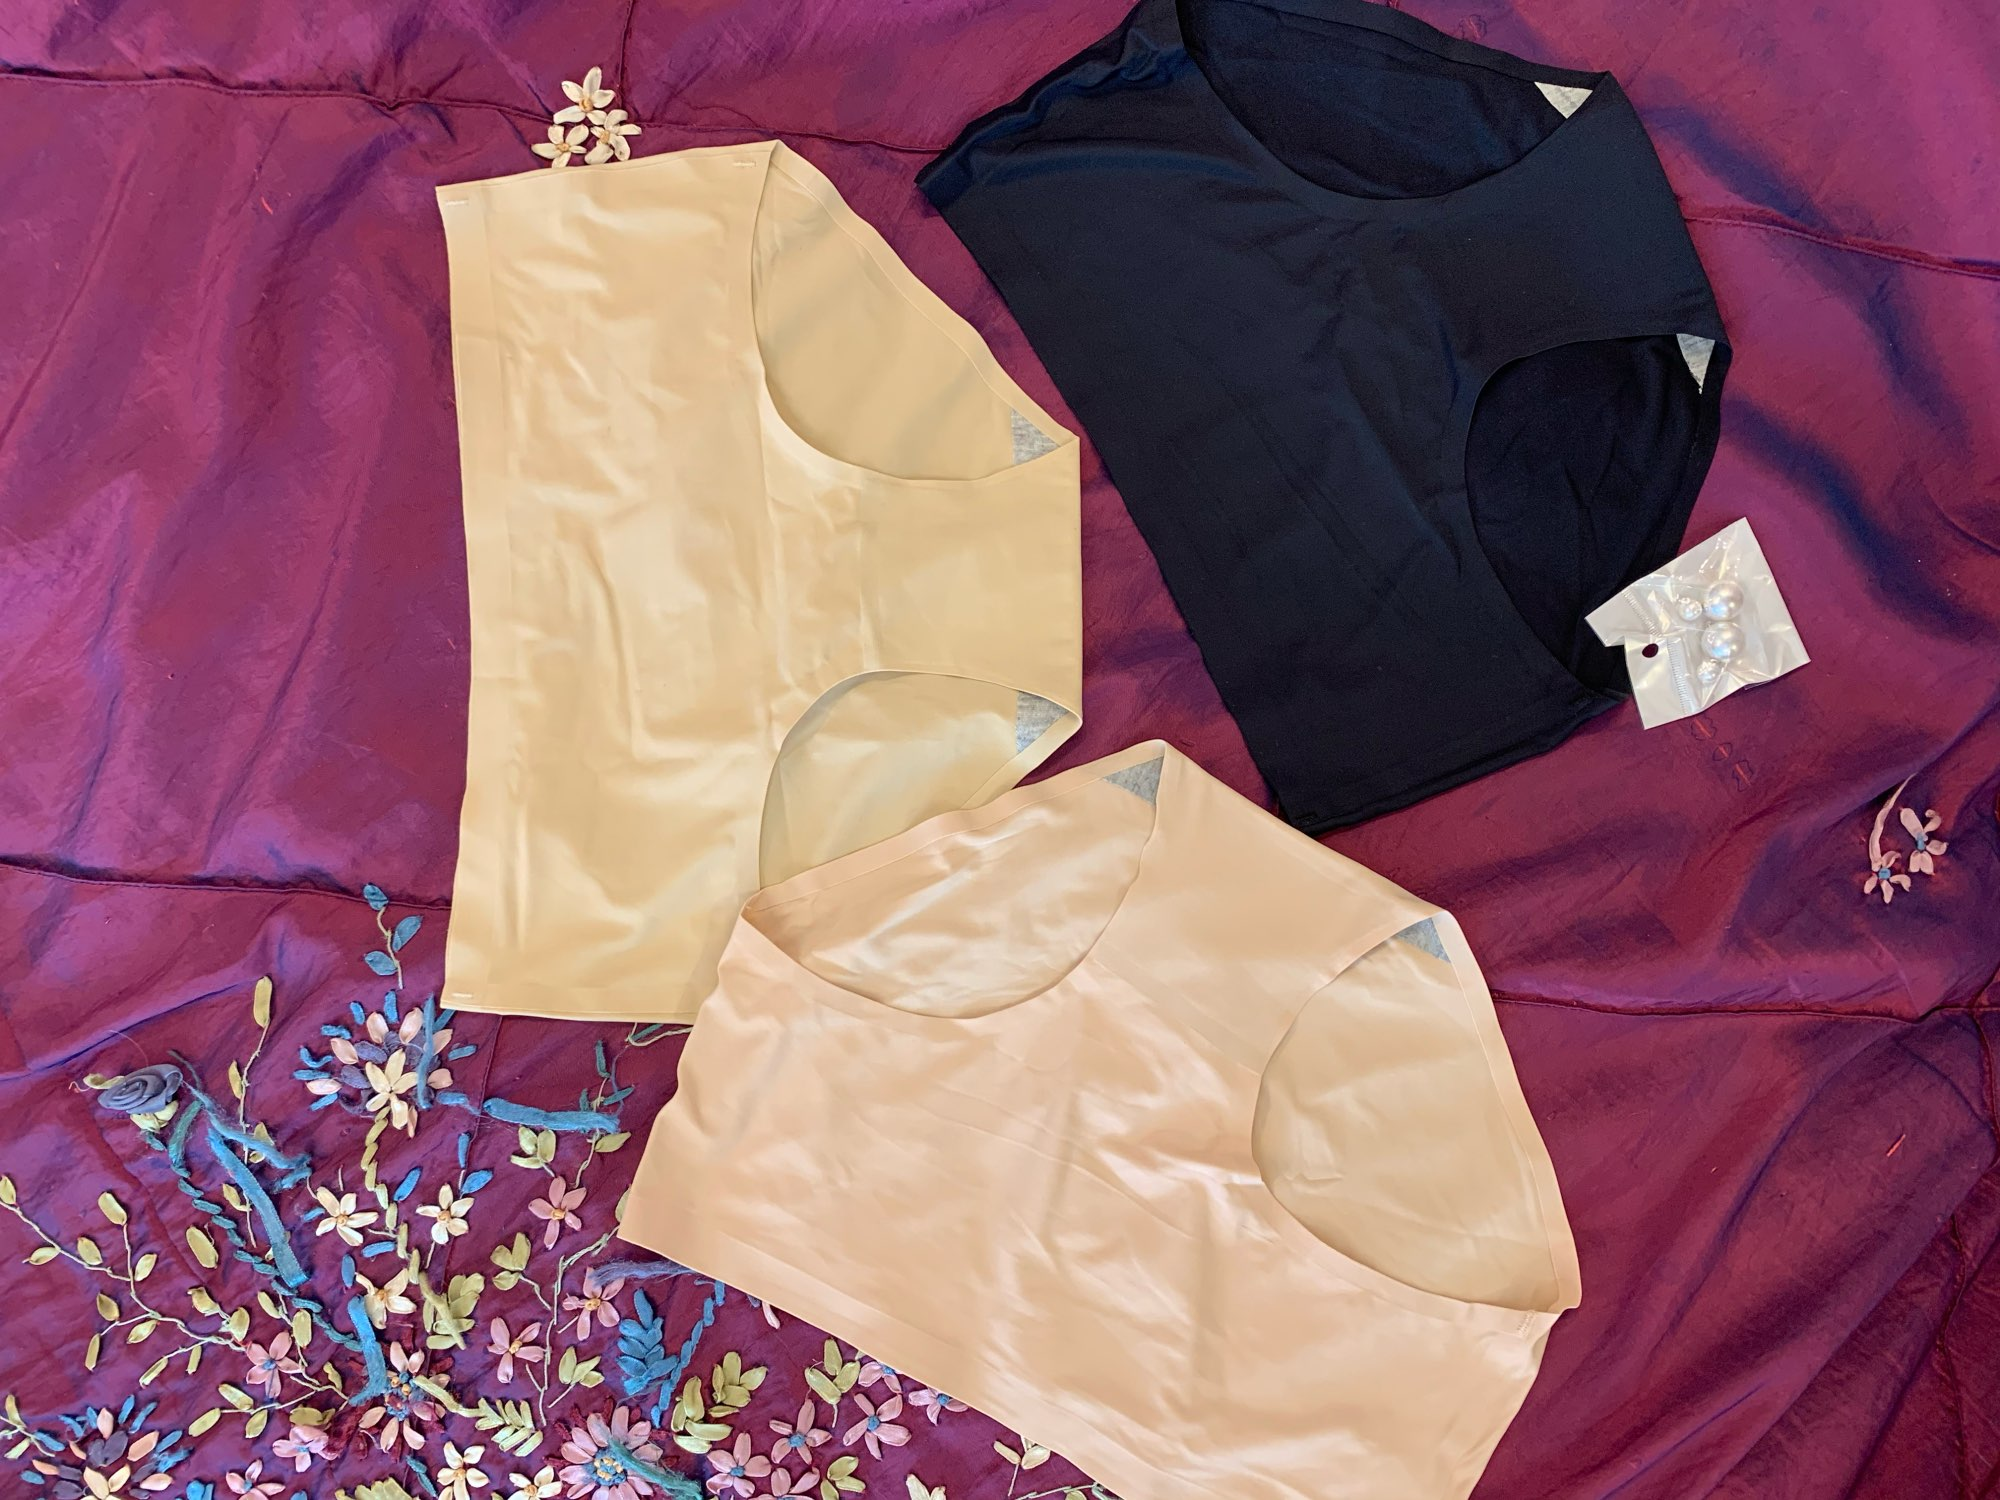 ALLMIX 3Pcs/Lot Sexy Women's SPorts Panties Sets Underwear Seamless Comfortable Underpants Low Waist Female Briefs Lady Lingerie photo review